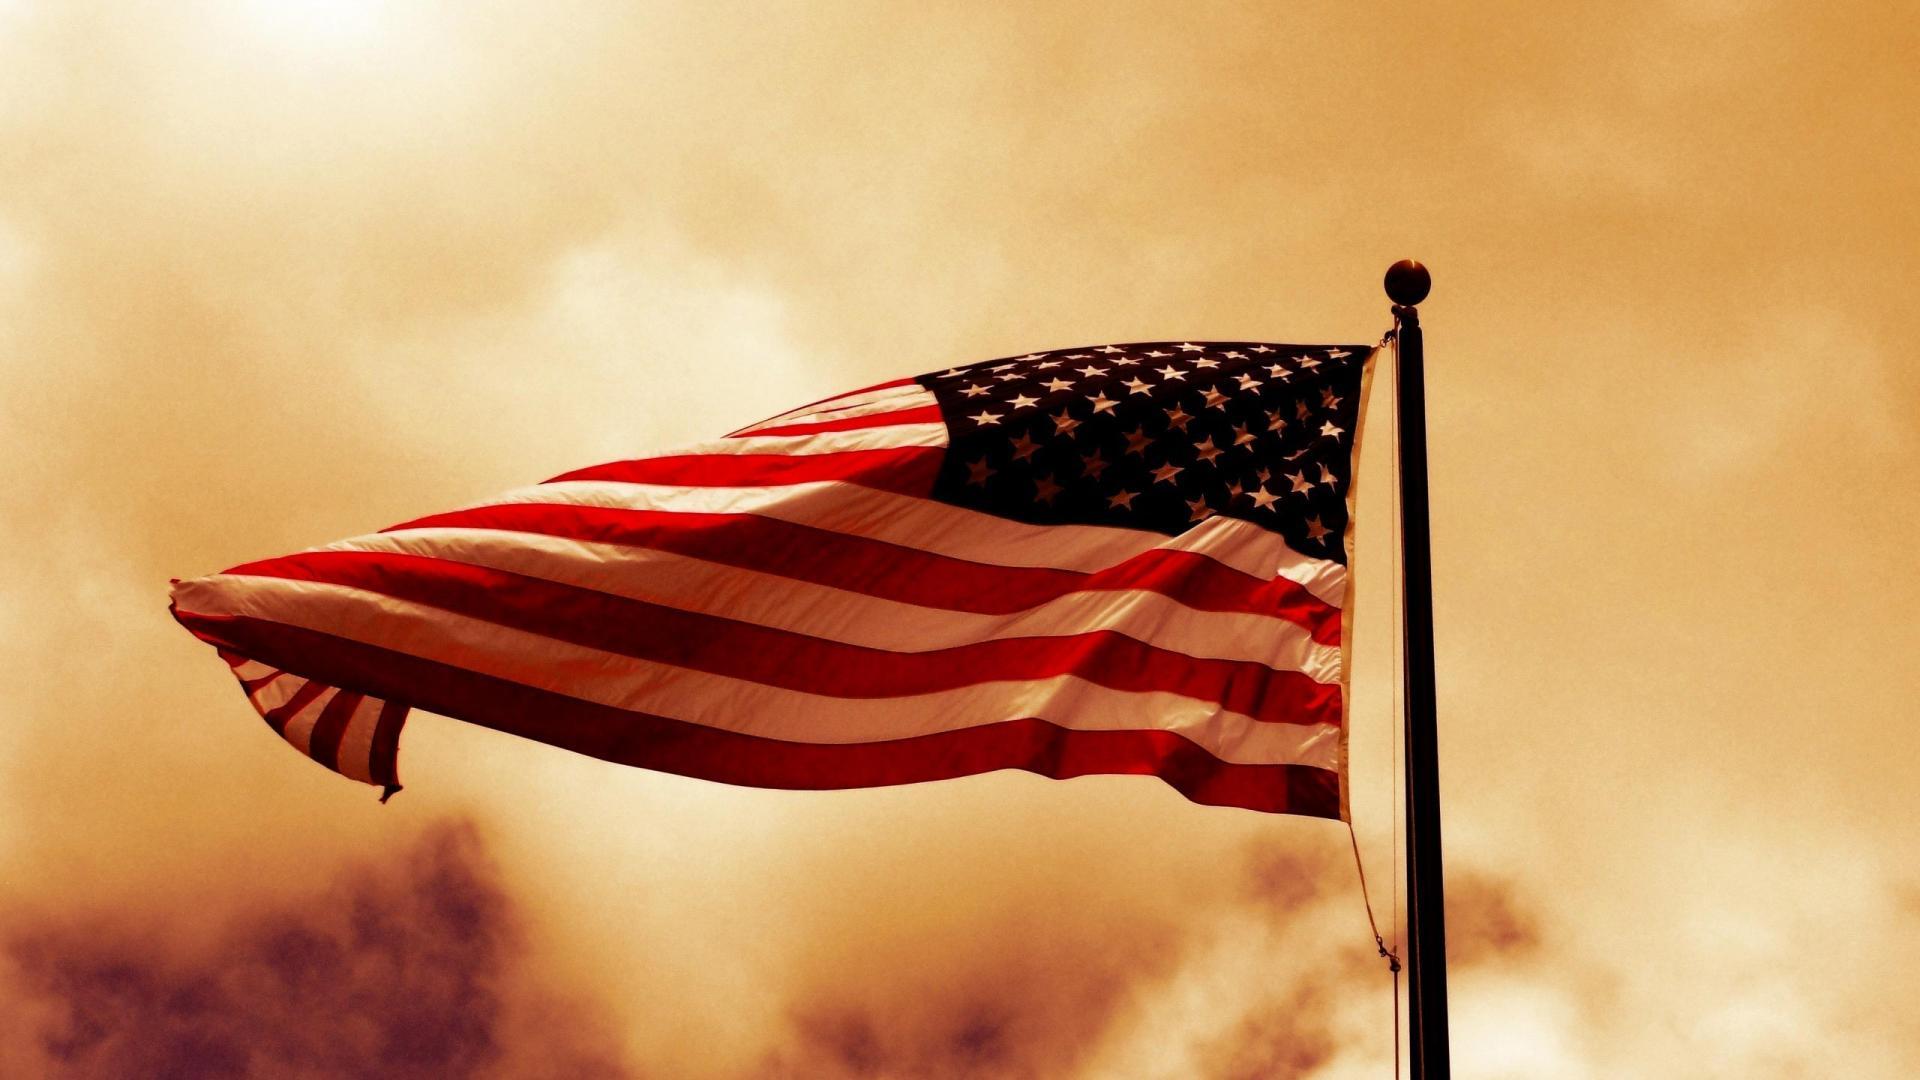 USA American Flag HD Wallpaper of Flag   hdwallpaper2013com 1920x1080